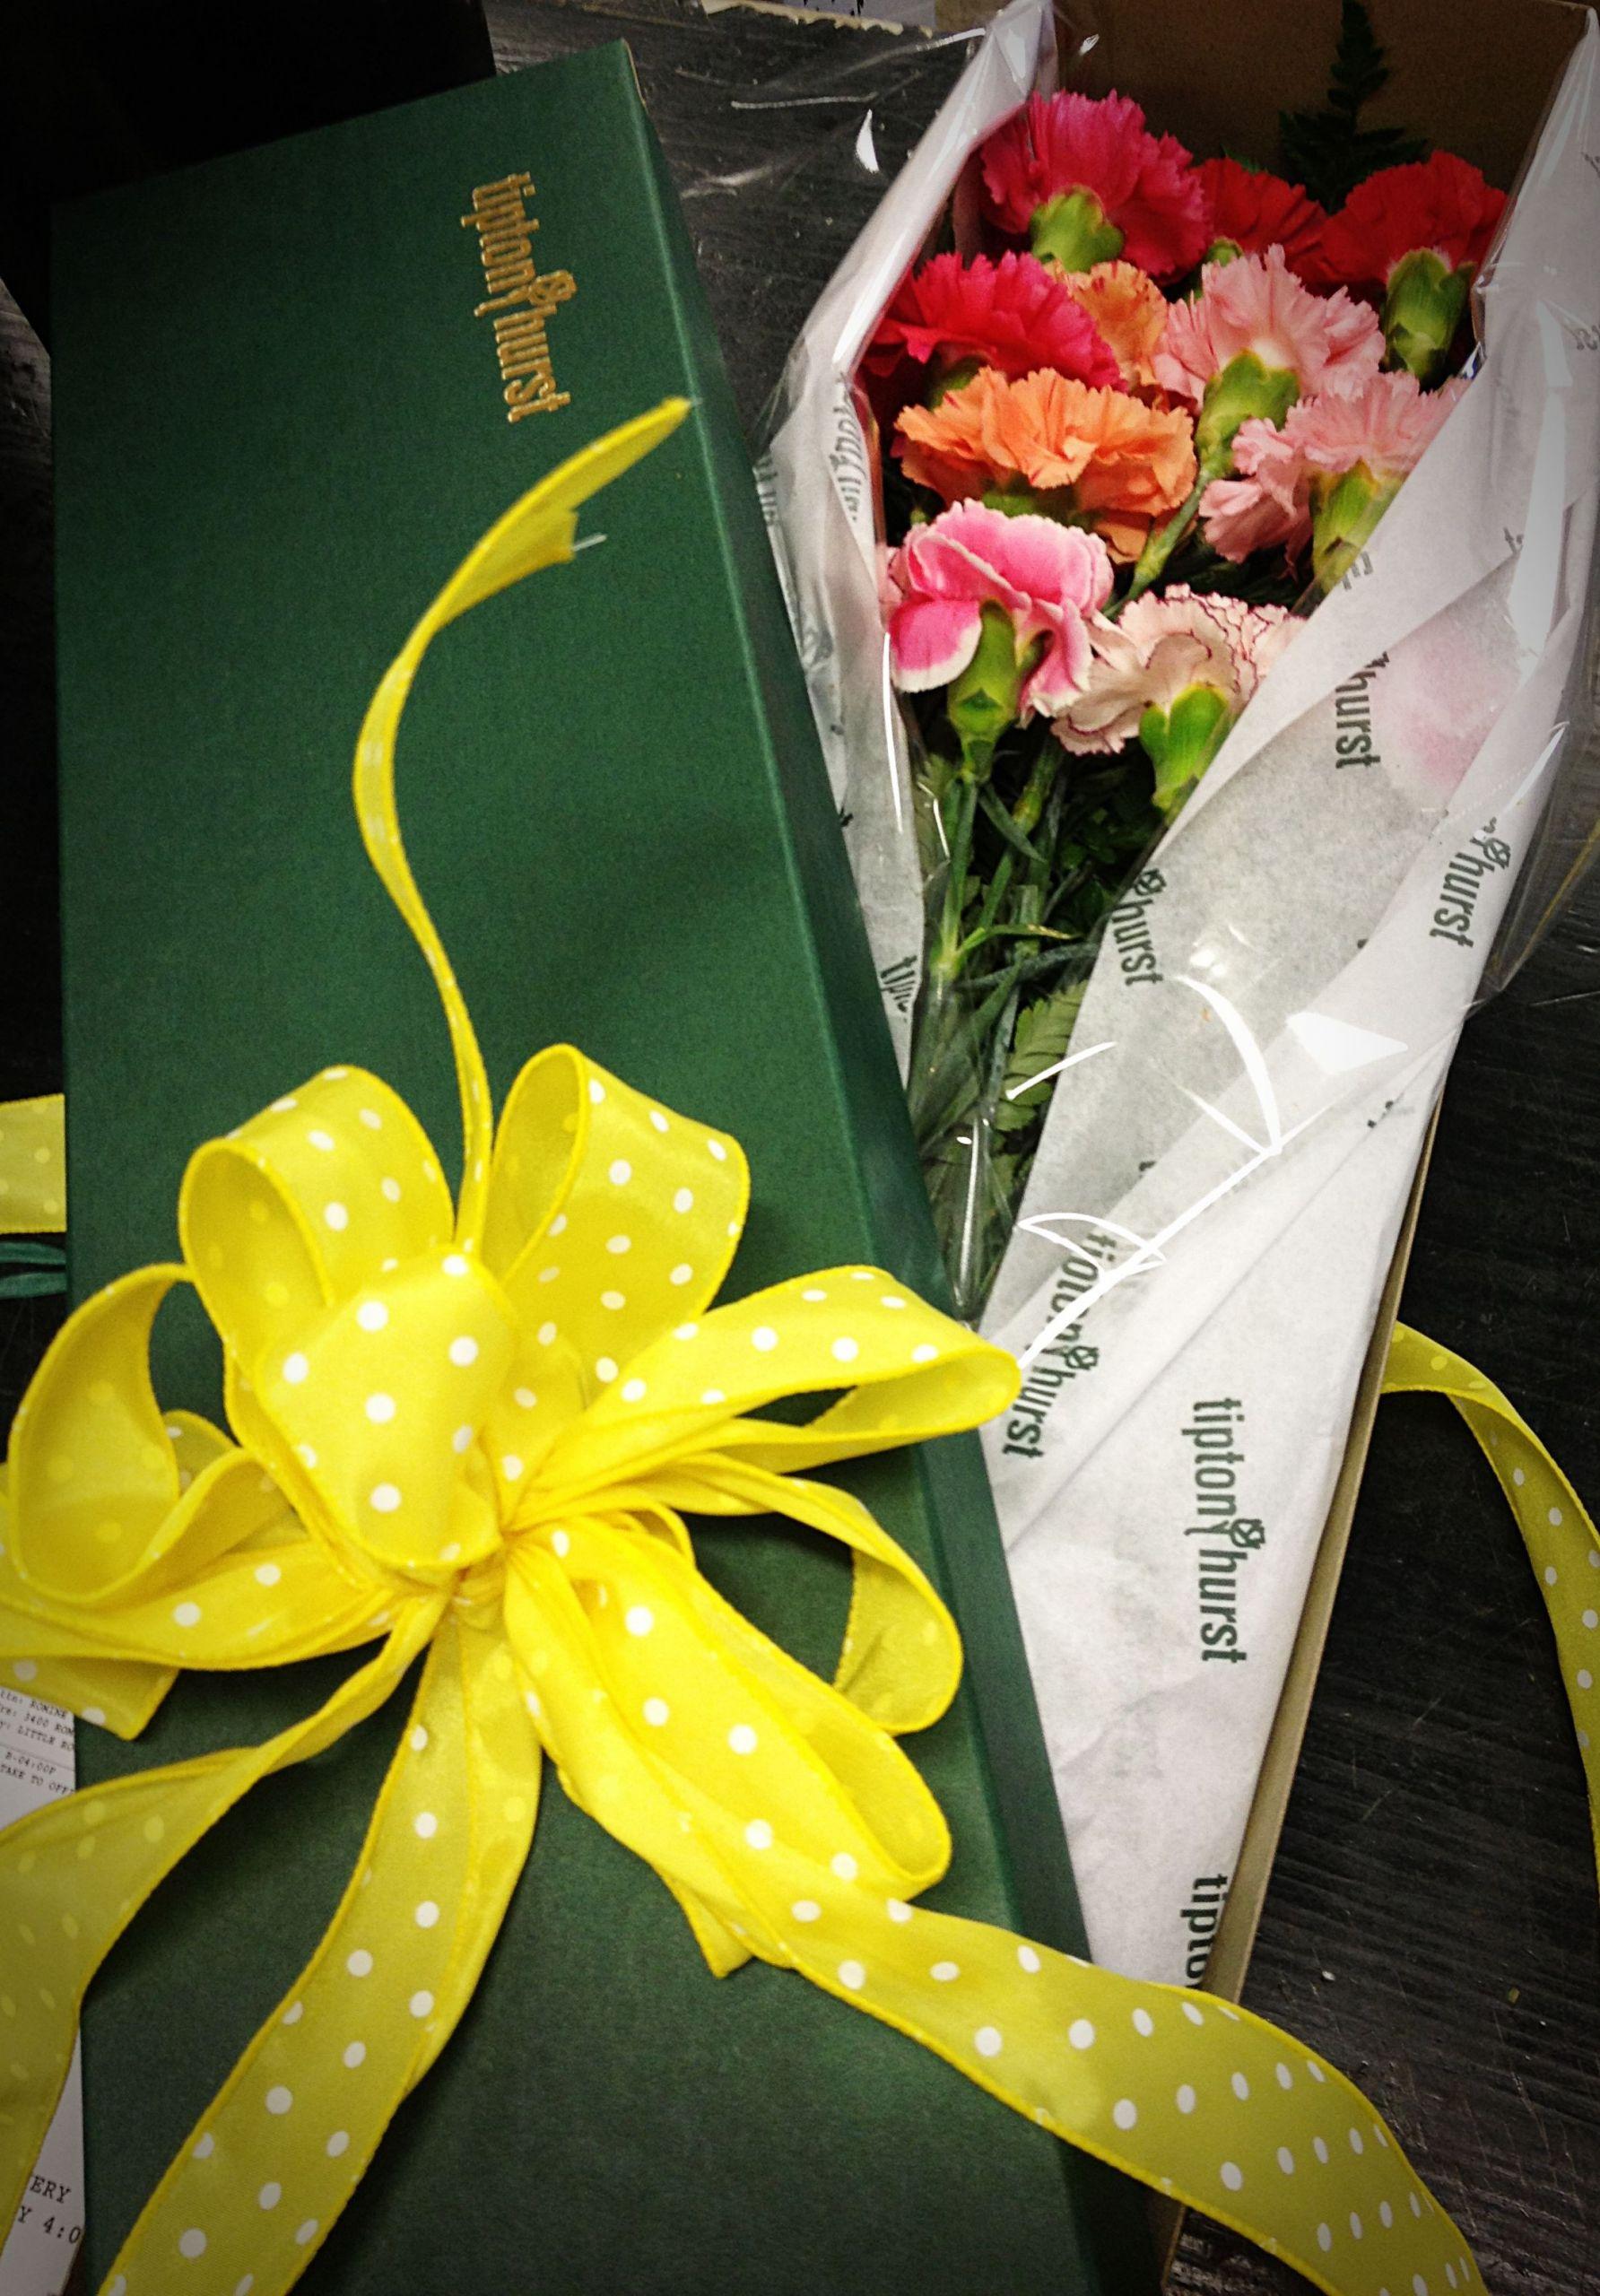 Elementary School Graduation Gift Ideas  BOXED CARNATIONS FOR AN ELEMENTARY SCHOOL GRADUATION GIFT